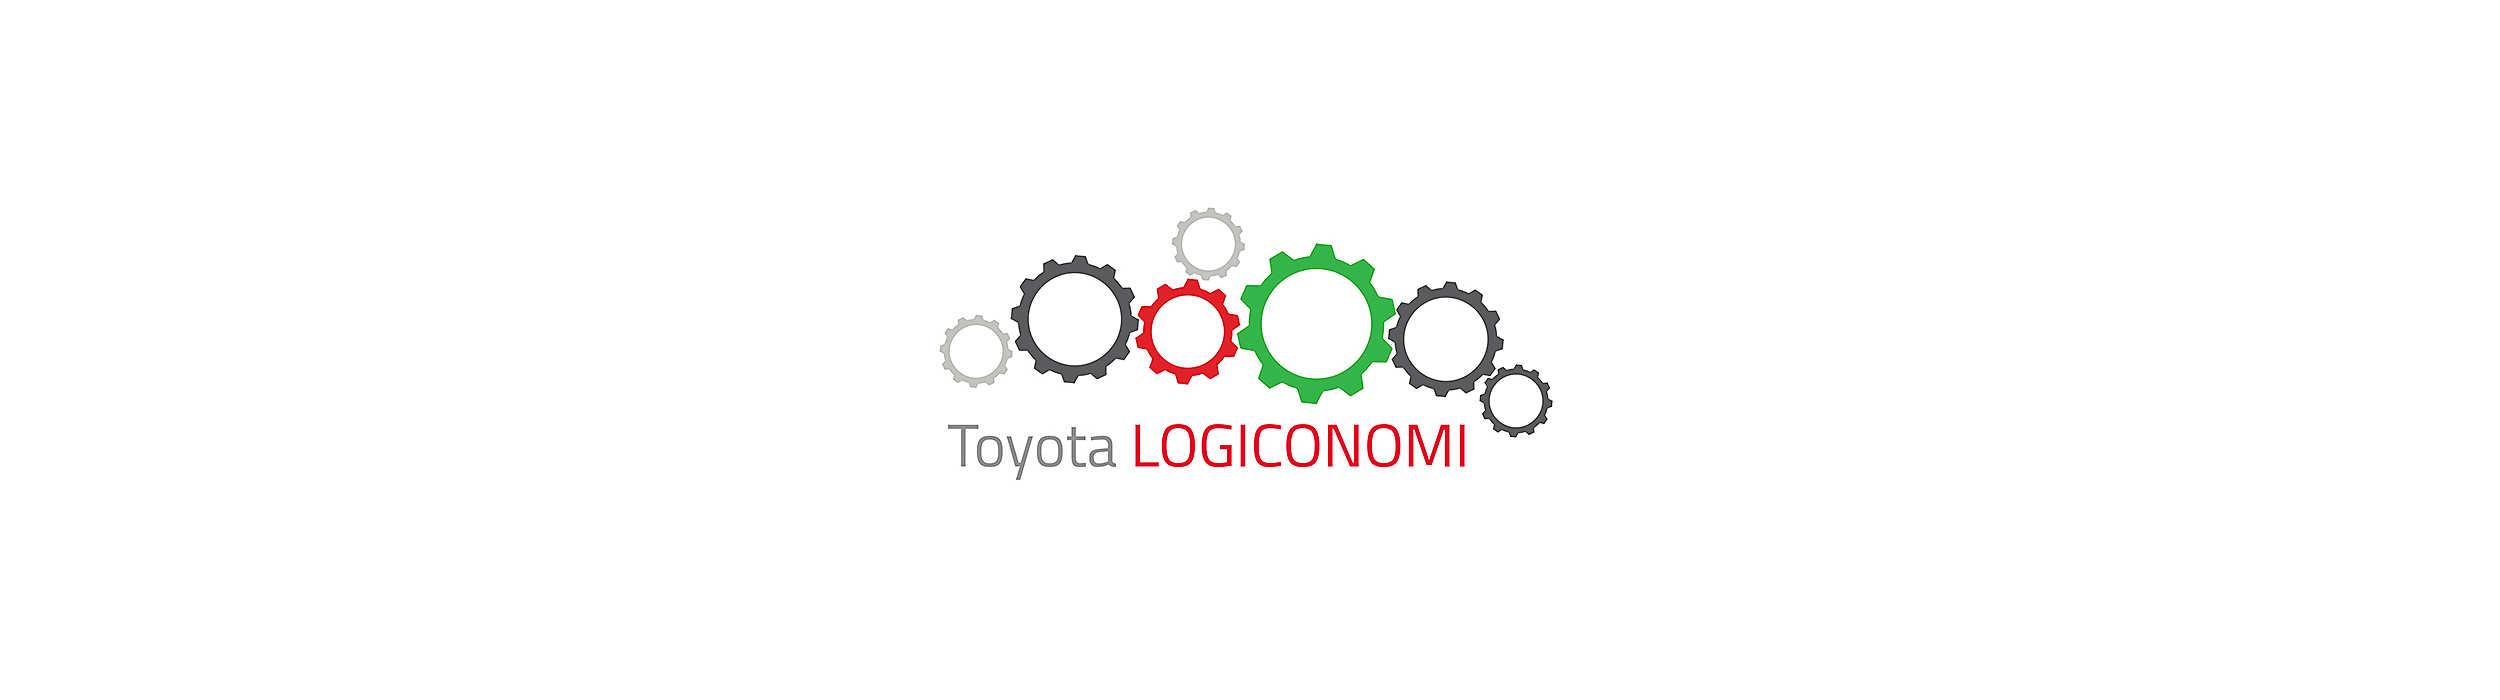 Logiconomi logo